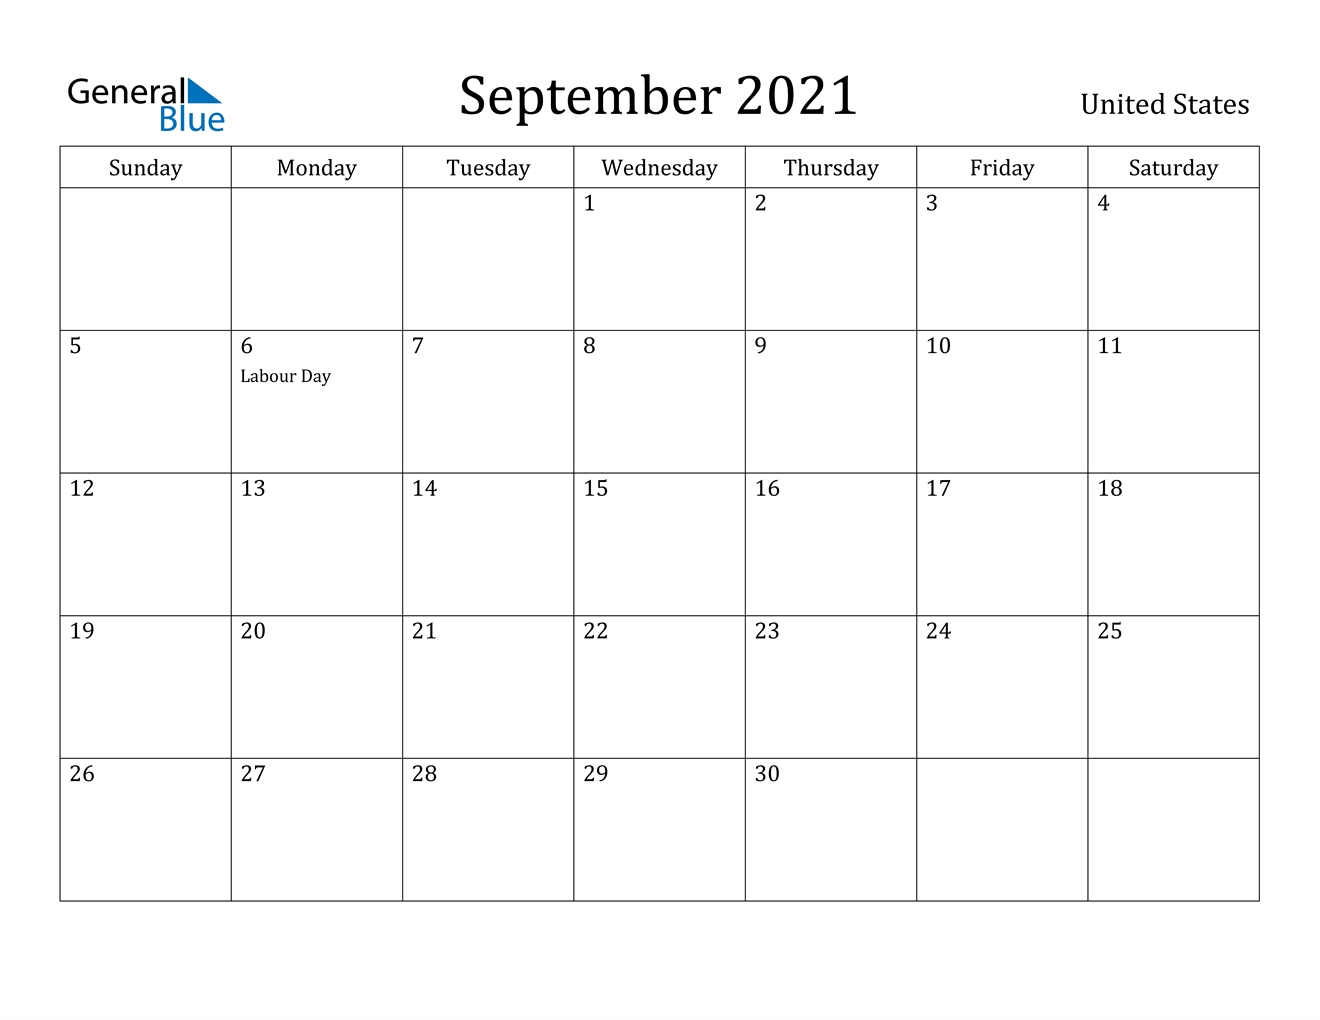 September 2021 Calendar - United States September 2021 Calendar Image